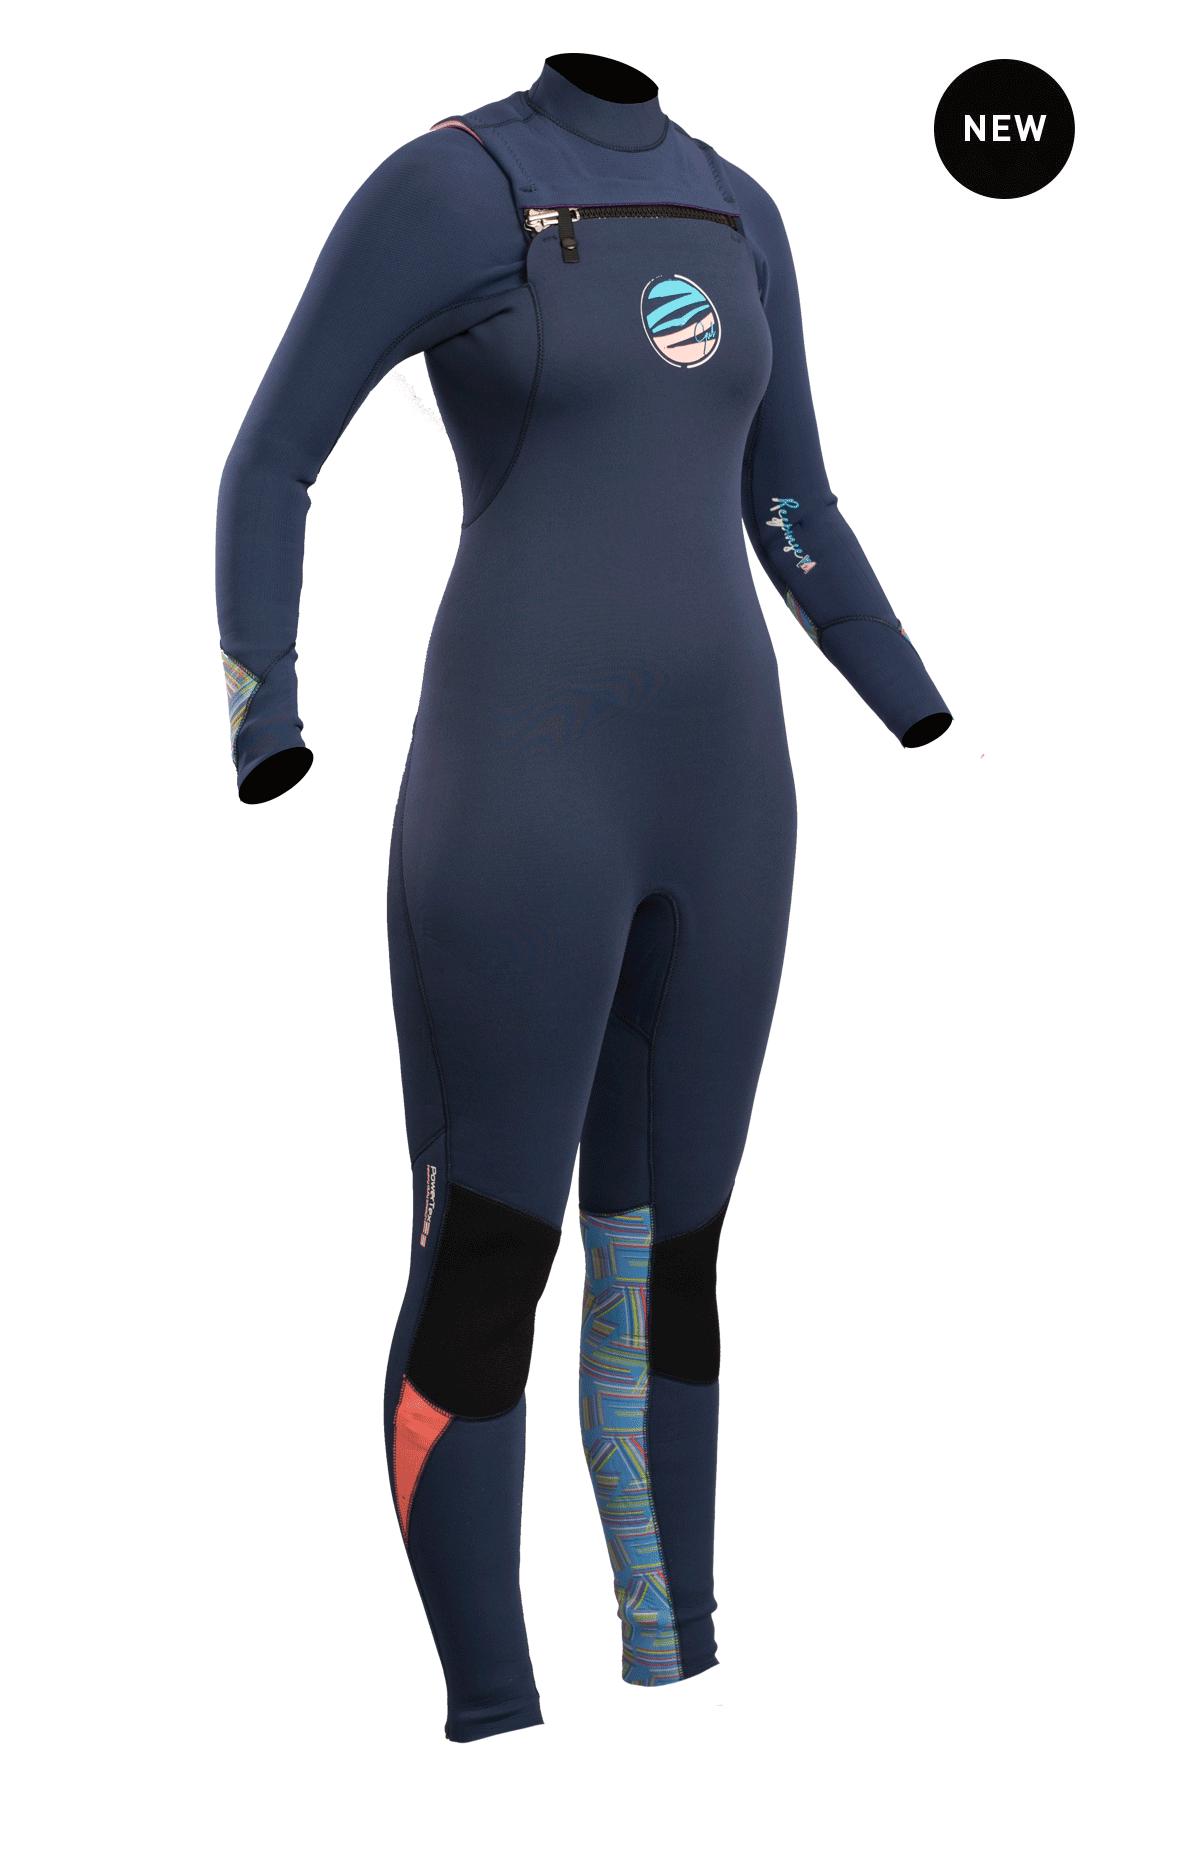 Gul Respones Fx Ladies Cz 3/2mm Bs Wetsuit  Re1262-B4